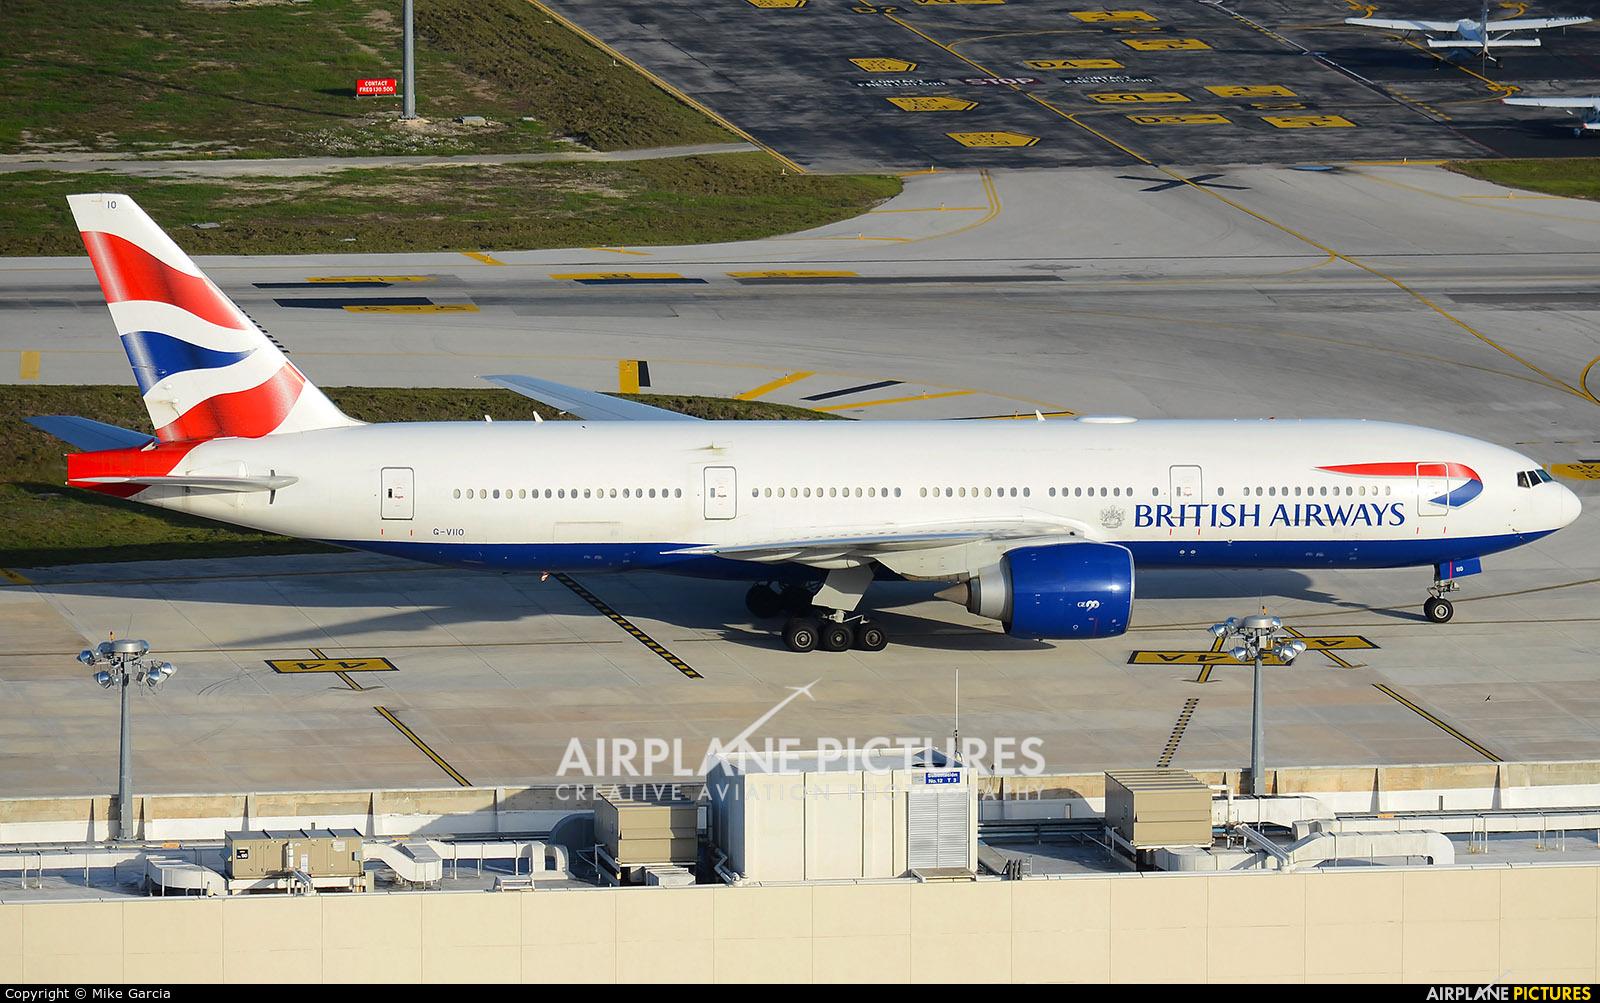 British Airways G-VIIO aircraft at Cancun Intl